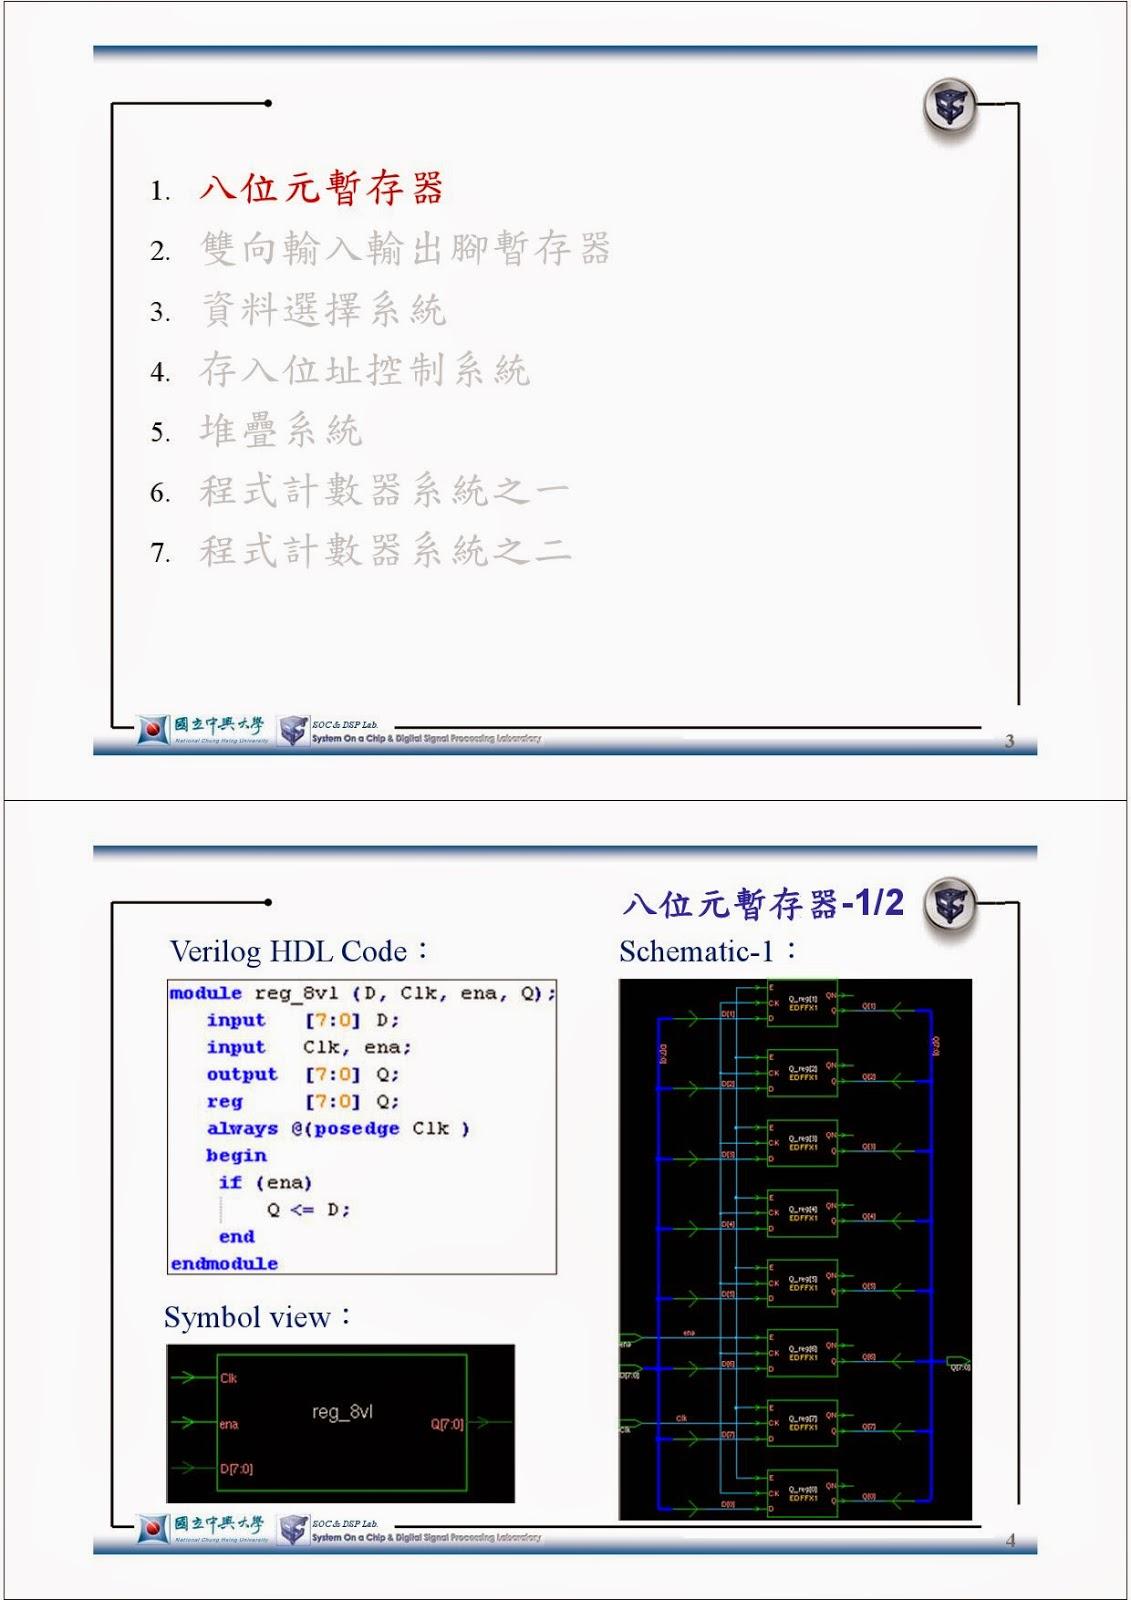 alex9ufo 聰明人求知心切: Verilog designexample pdf